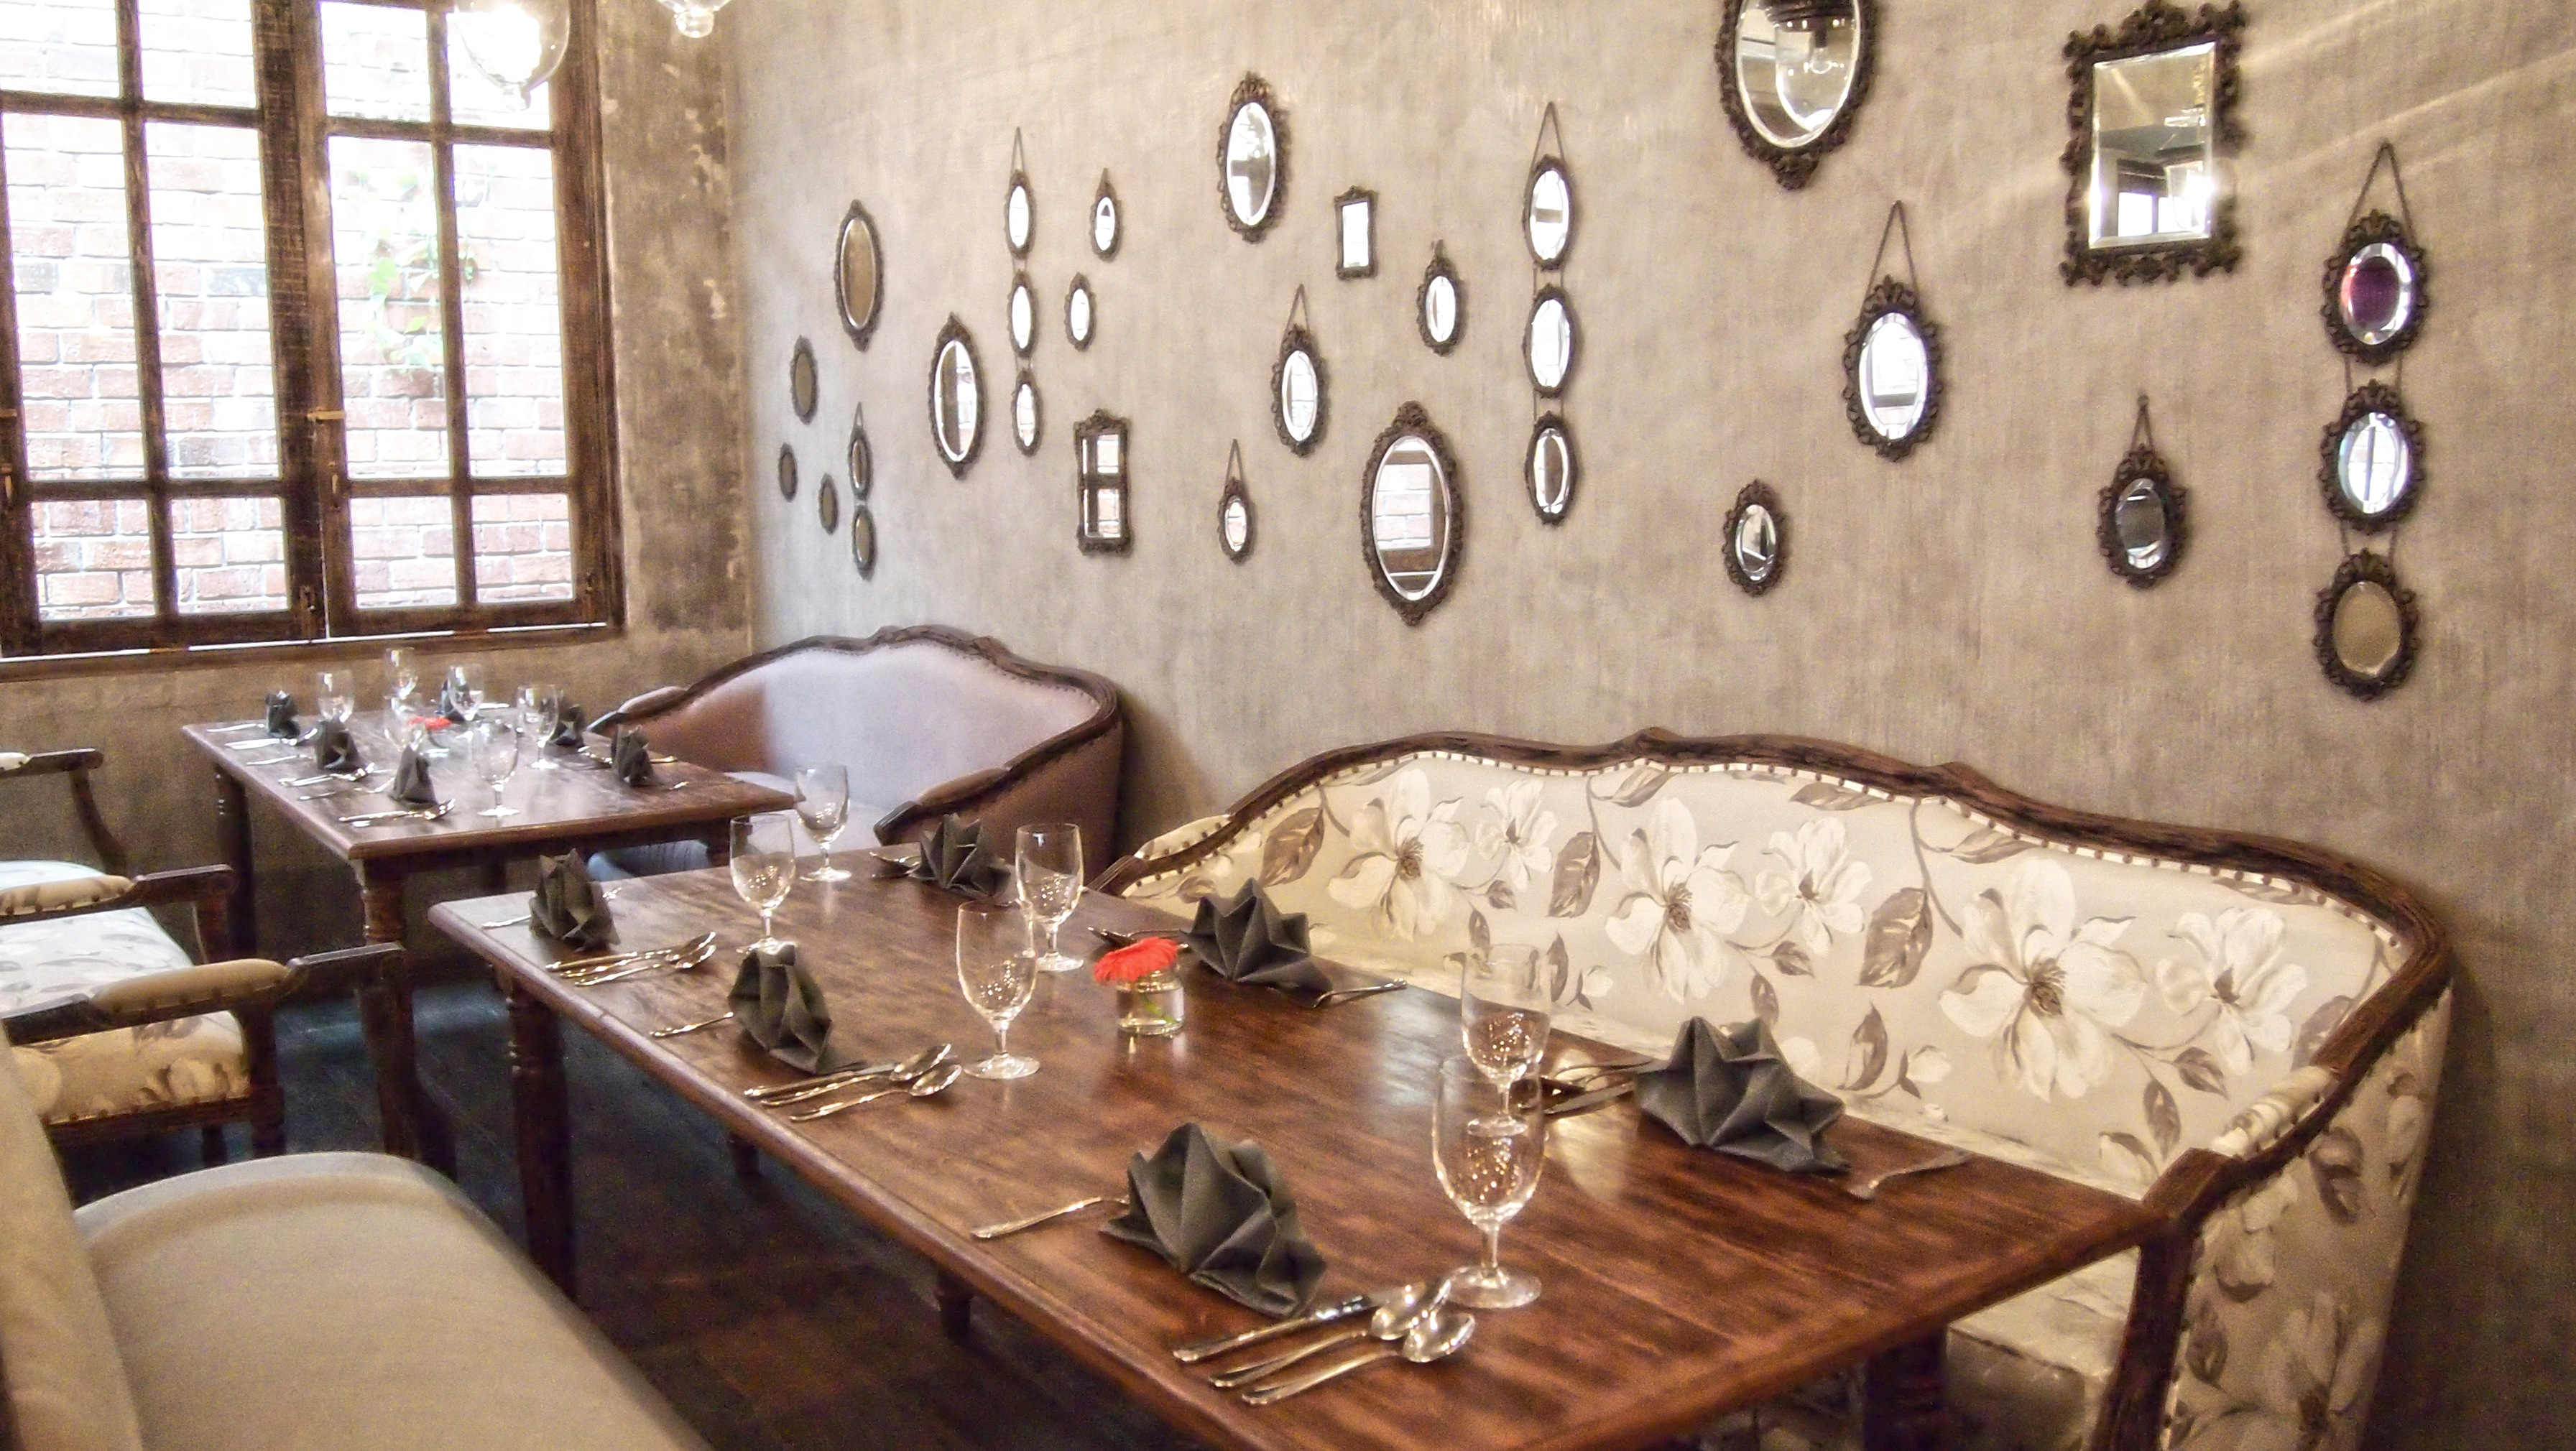 Bridal-shower-venuerific-blog-bistronomy-interior